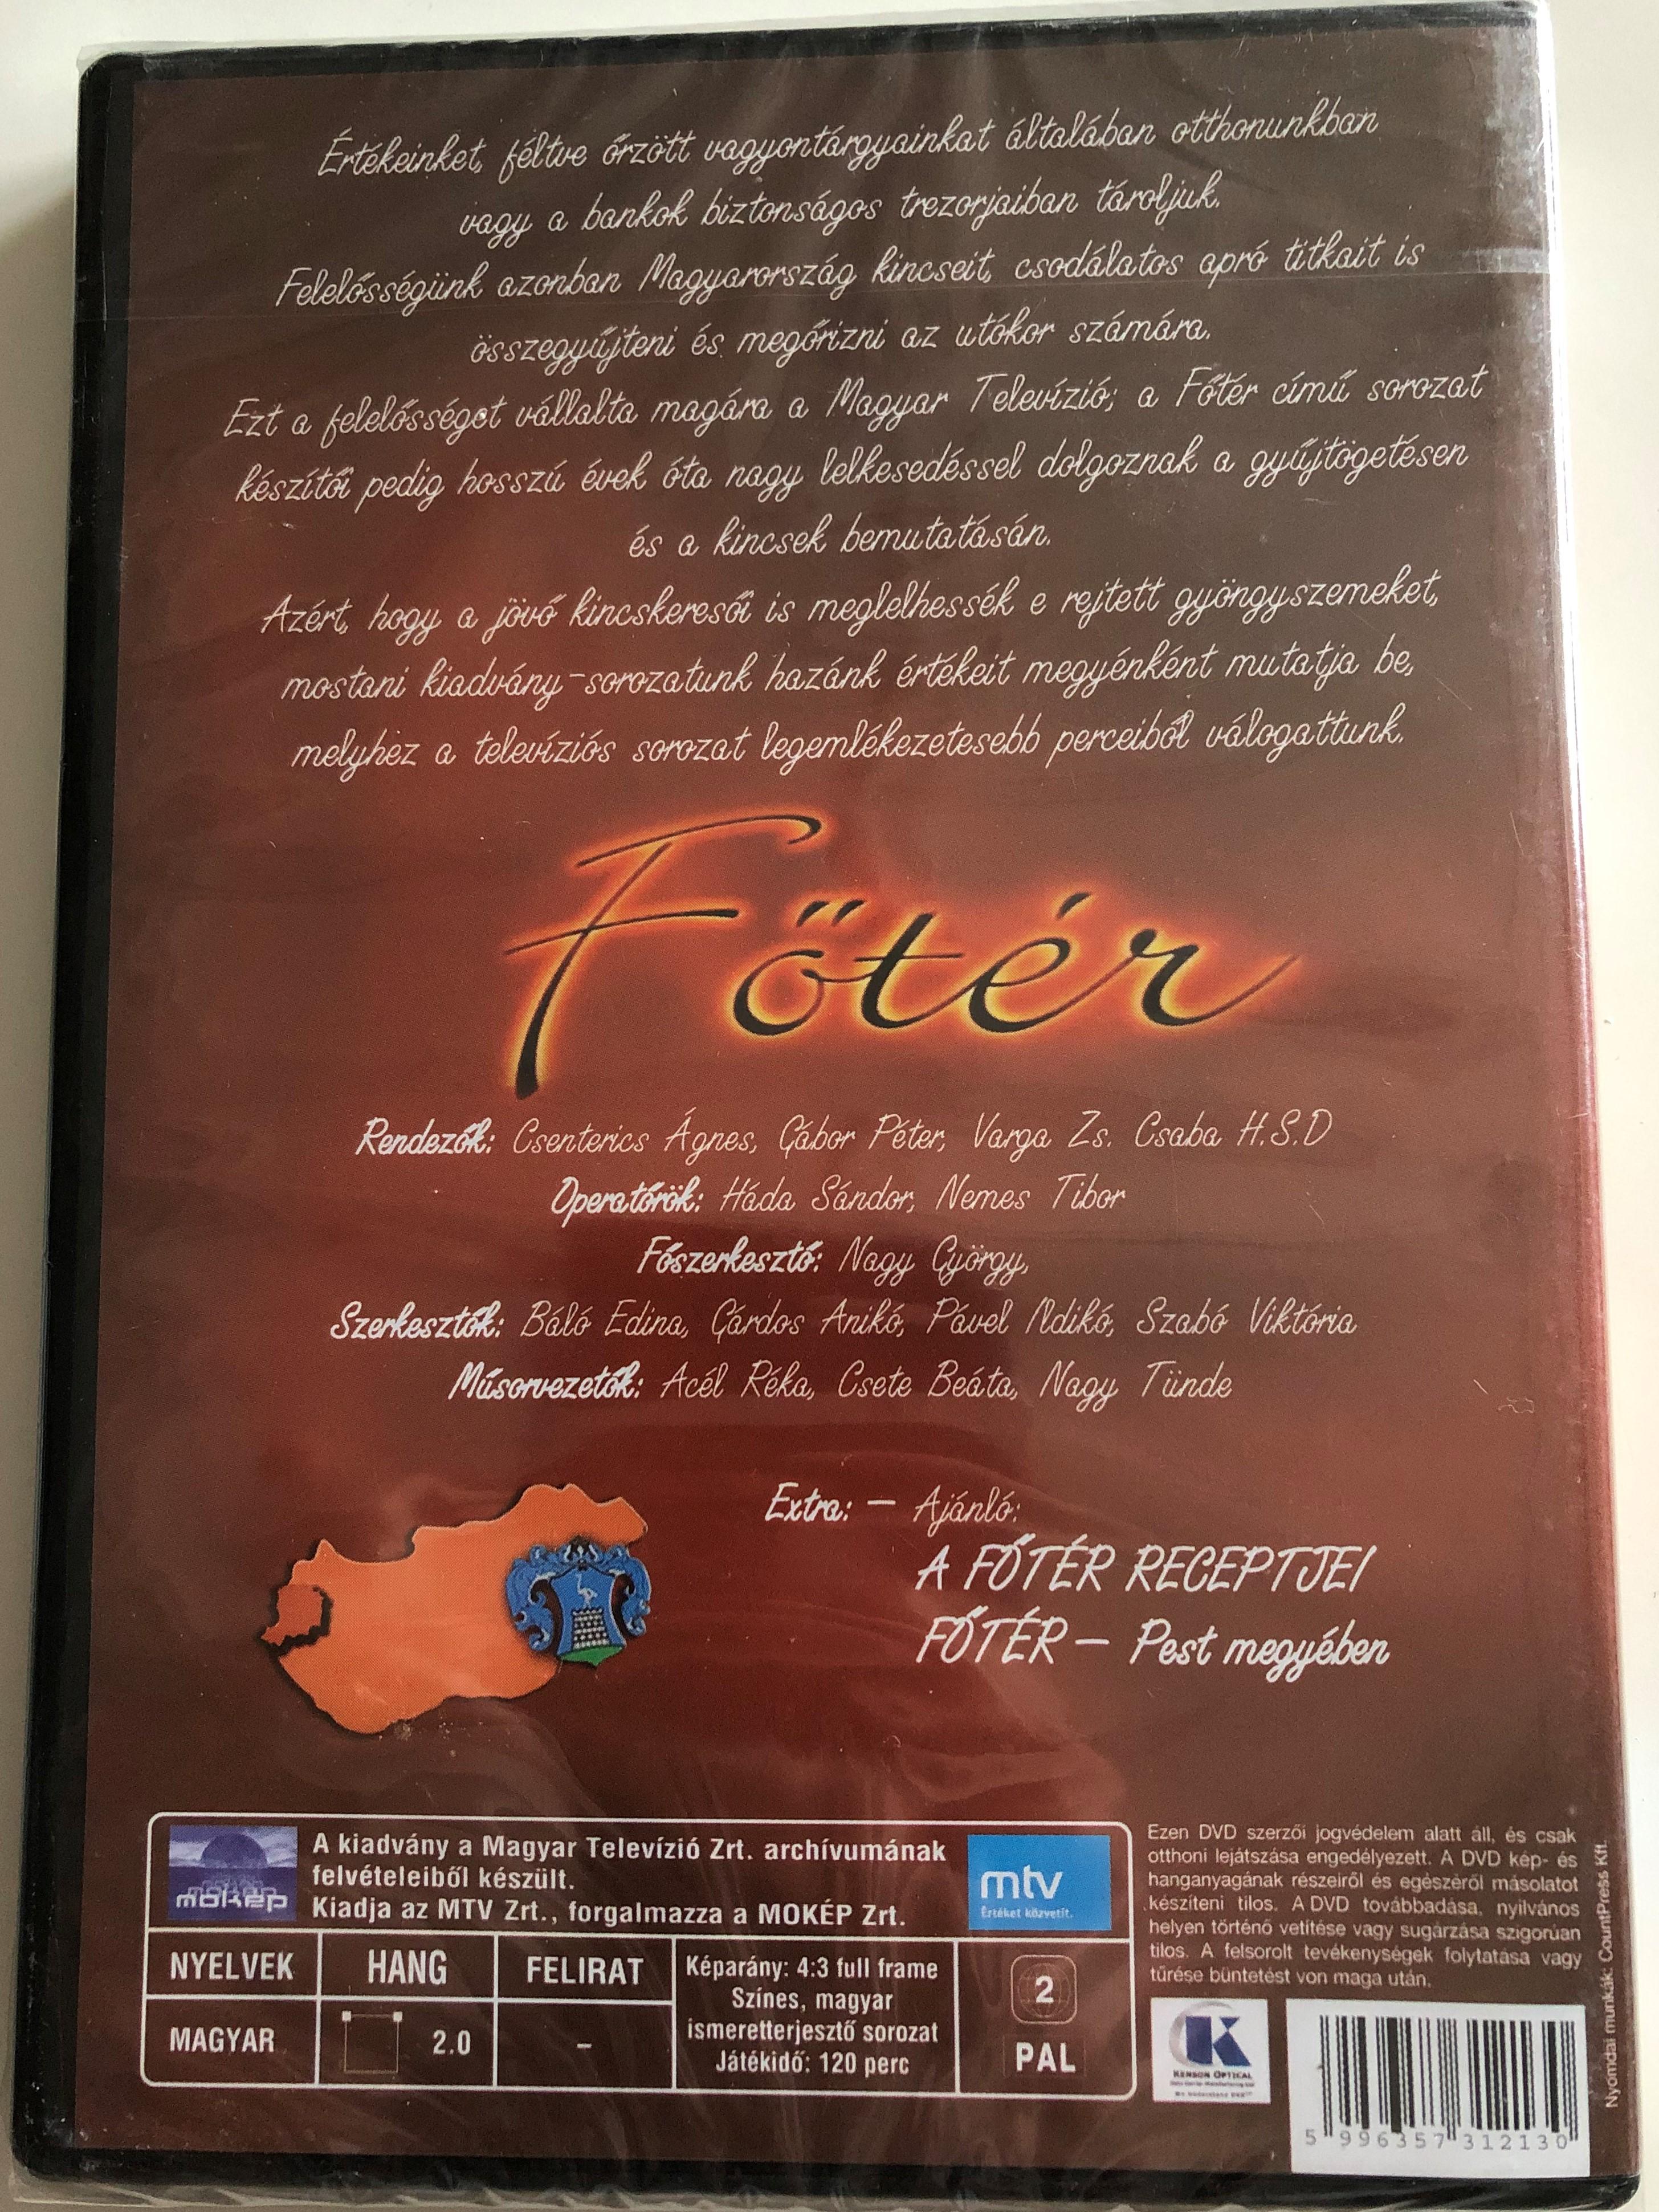 -f-t-r-vas-megy-ben-dvd-hungarian-educational-film-2.jpg